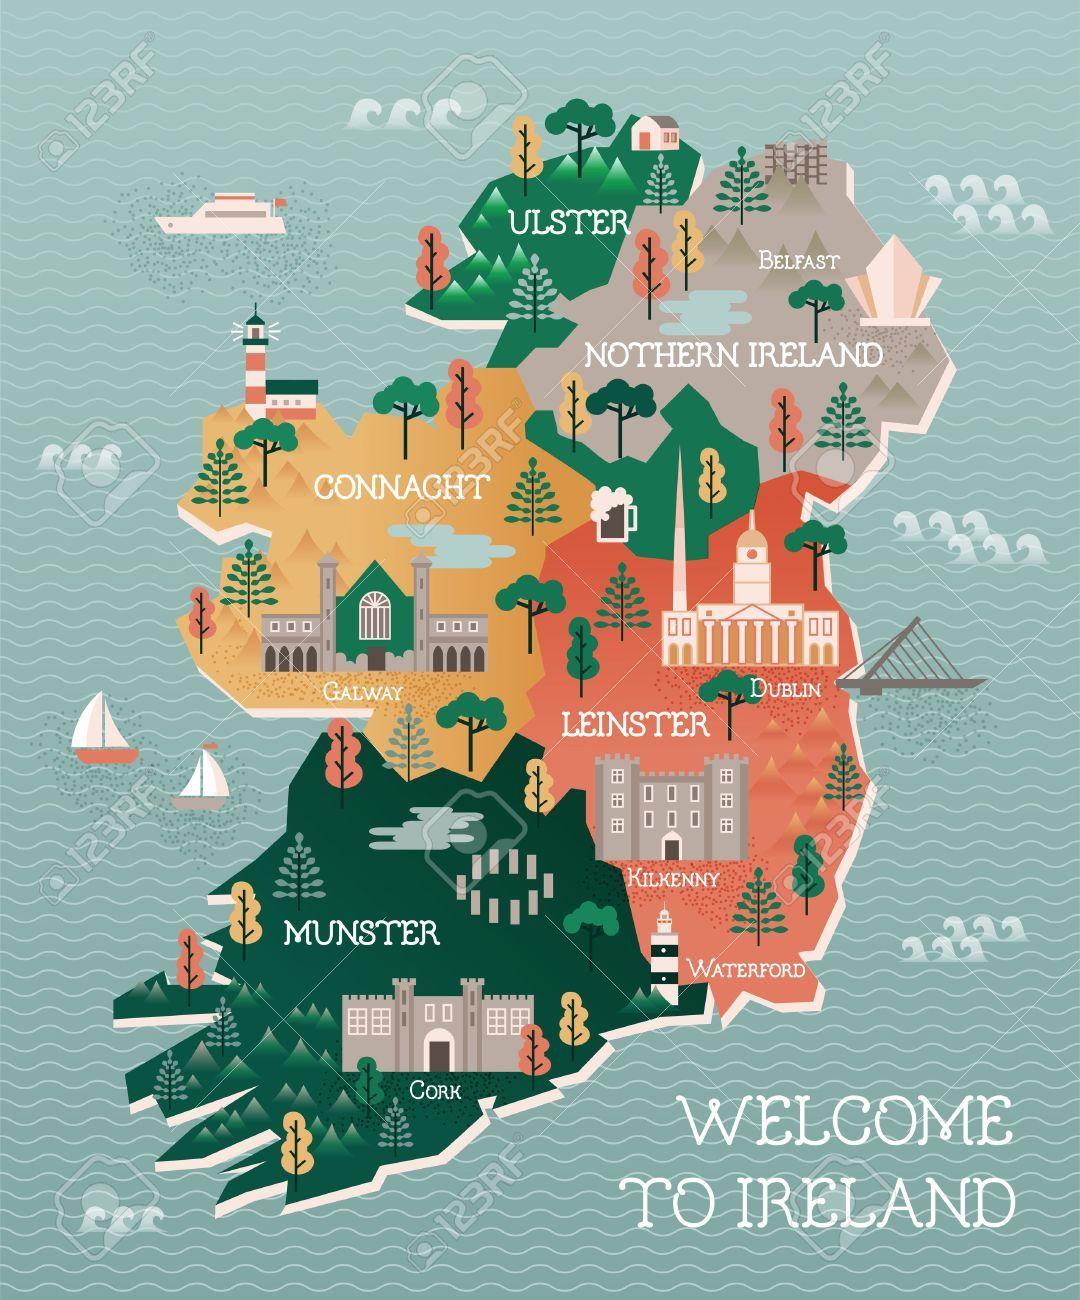 Map Of Ireland Vector.Stock Vector In 2019 Ireland Land Of My Dreams Ireland Travel